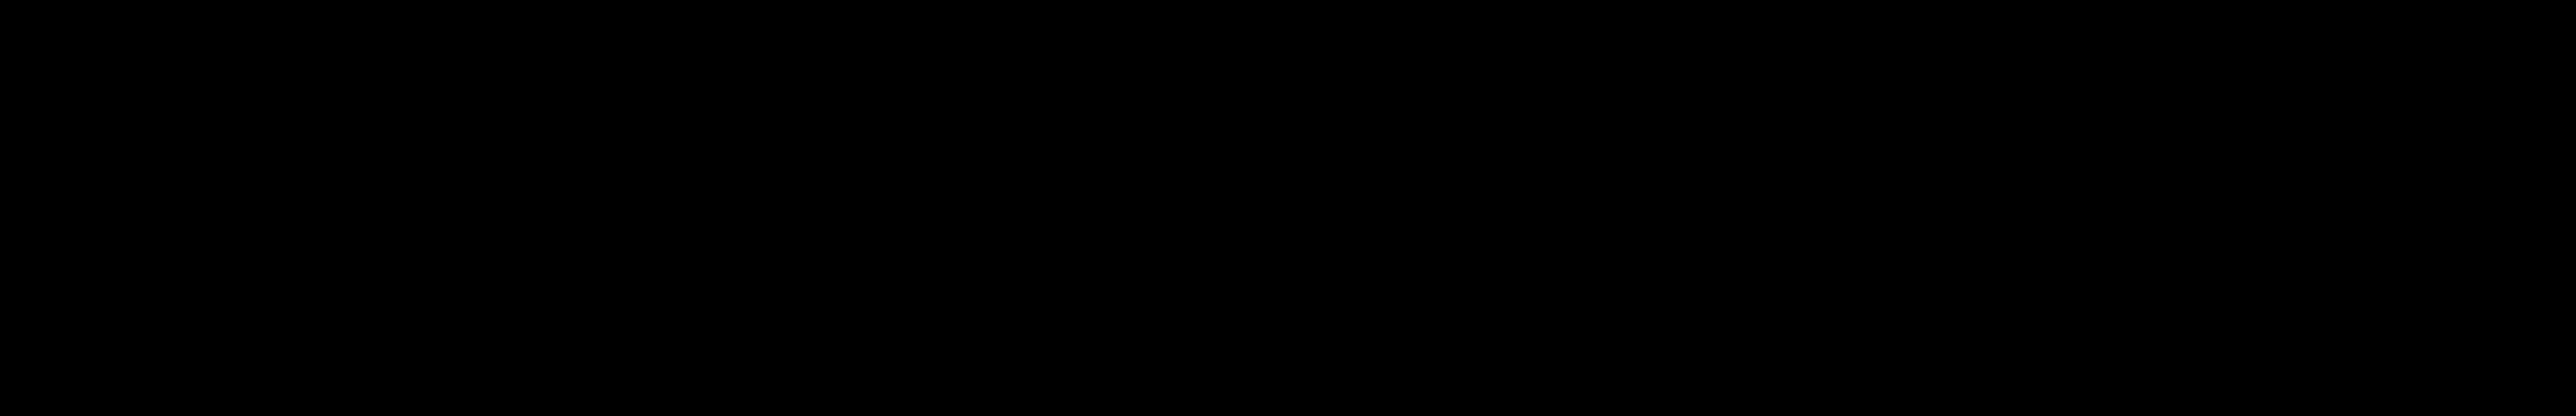 Logo-embodme-longueur